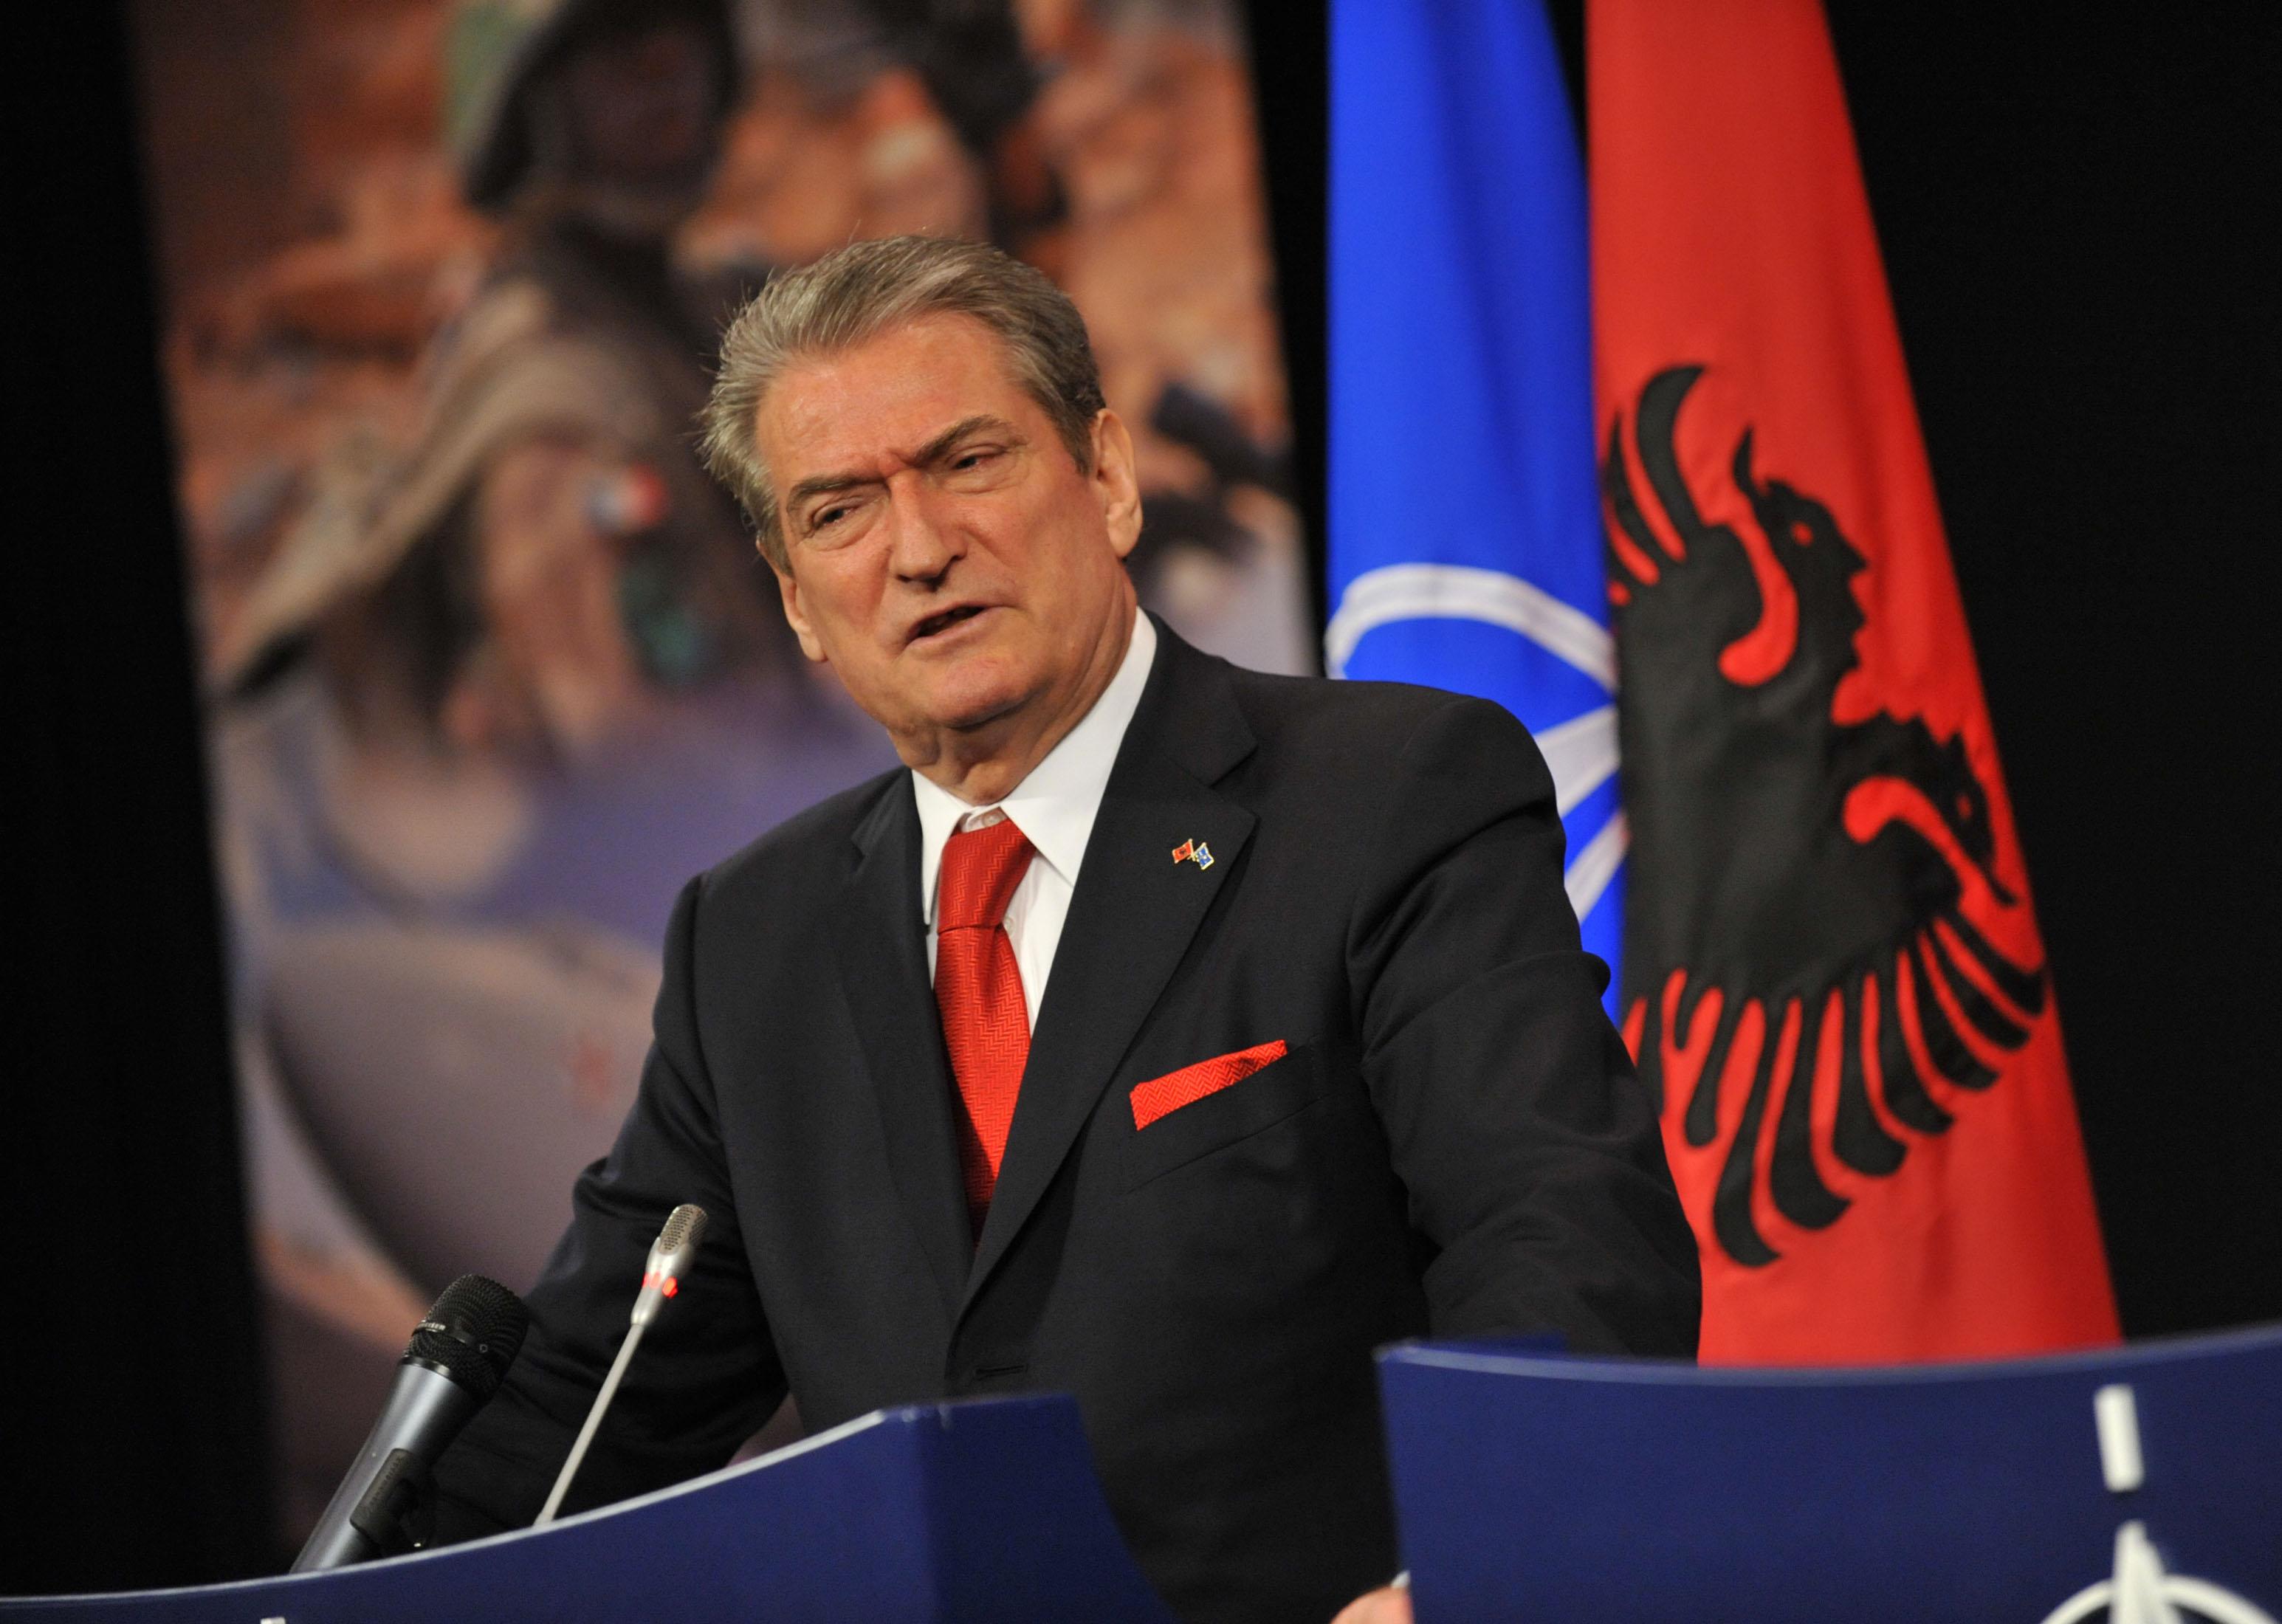 Sali Berisha (Prime Minister of Albania)